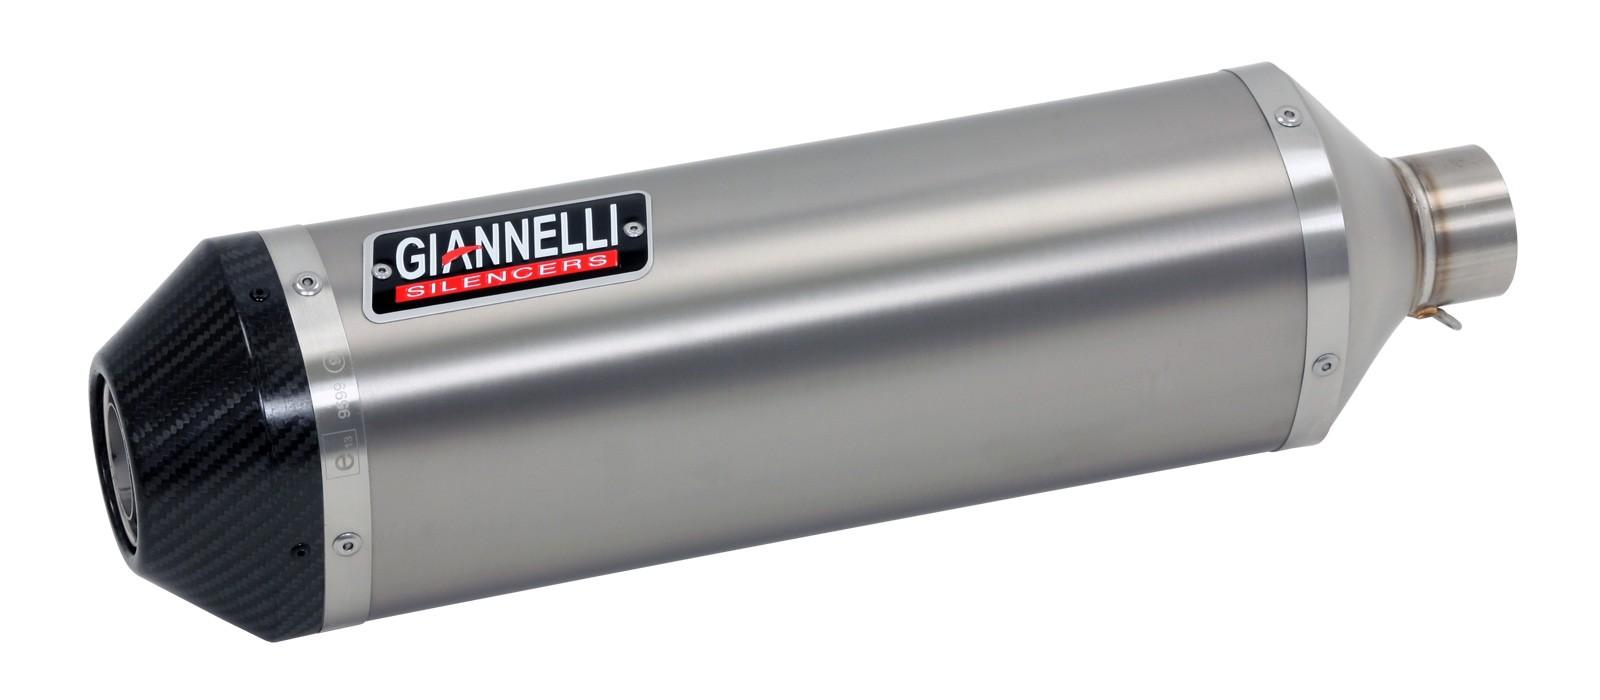 ESCAPES GIANNELLI YAMAHA - Sistema completo IPERSPORT Silenciador aluminio Yamaha BW'S 125 4T Giannelli 73783A6K -